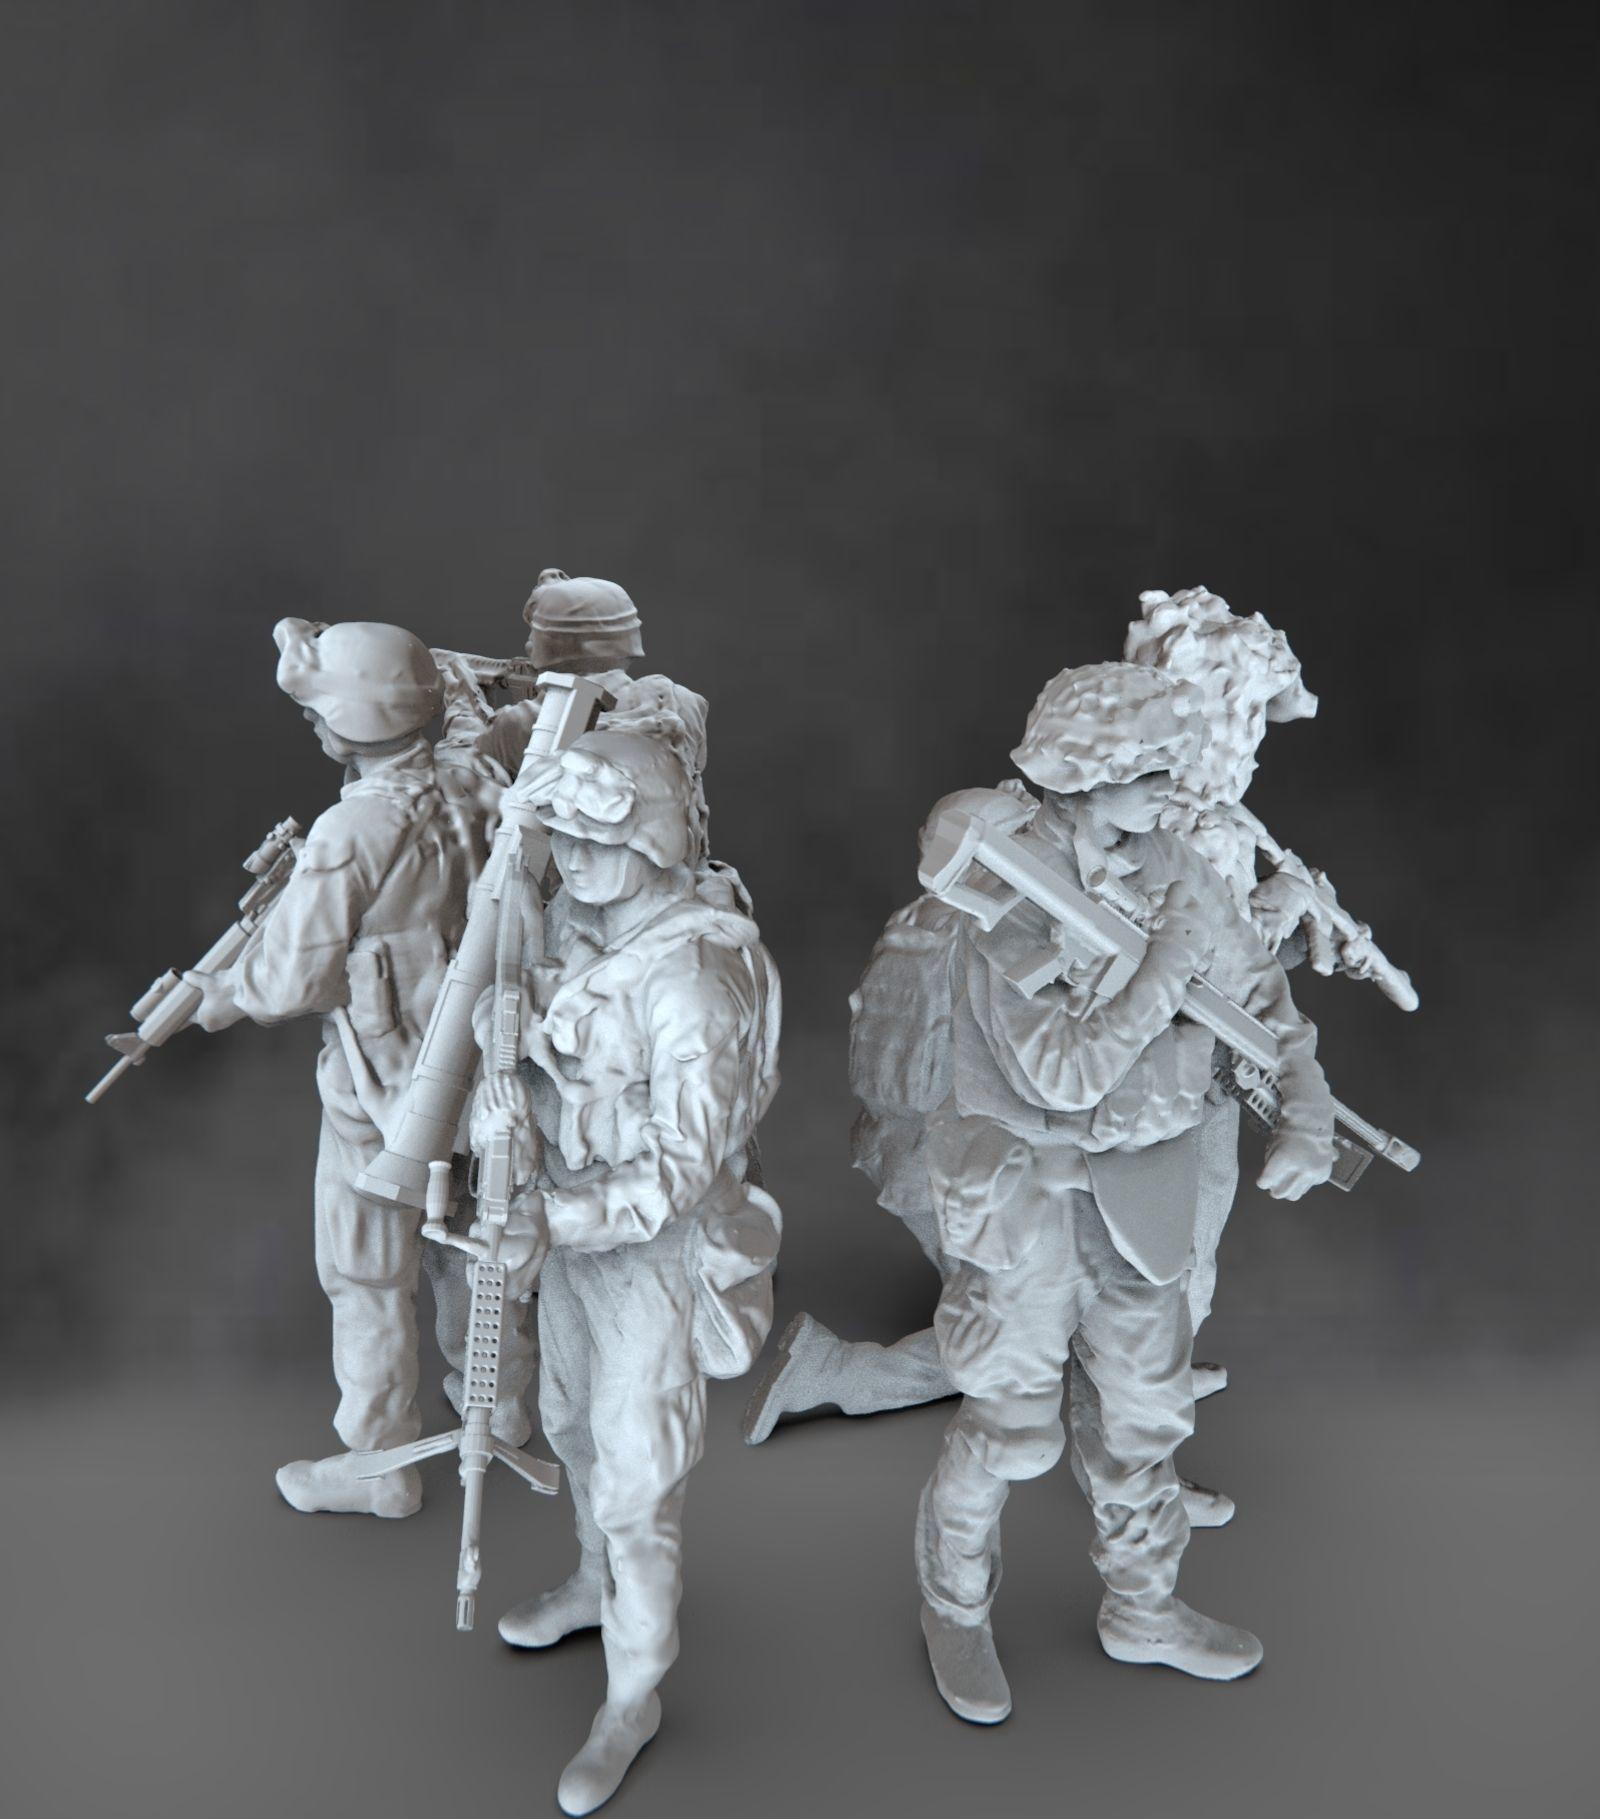 Modern soldiers set